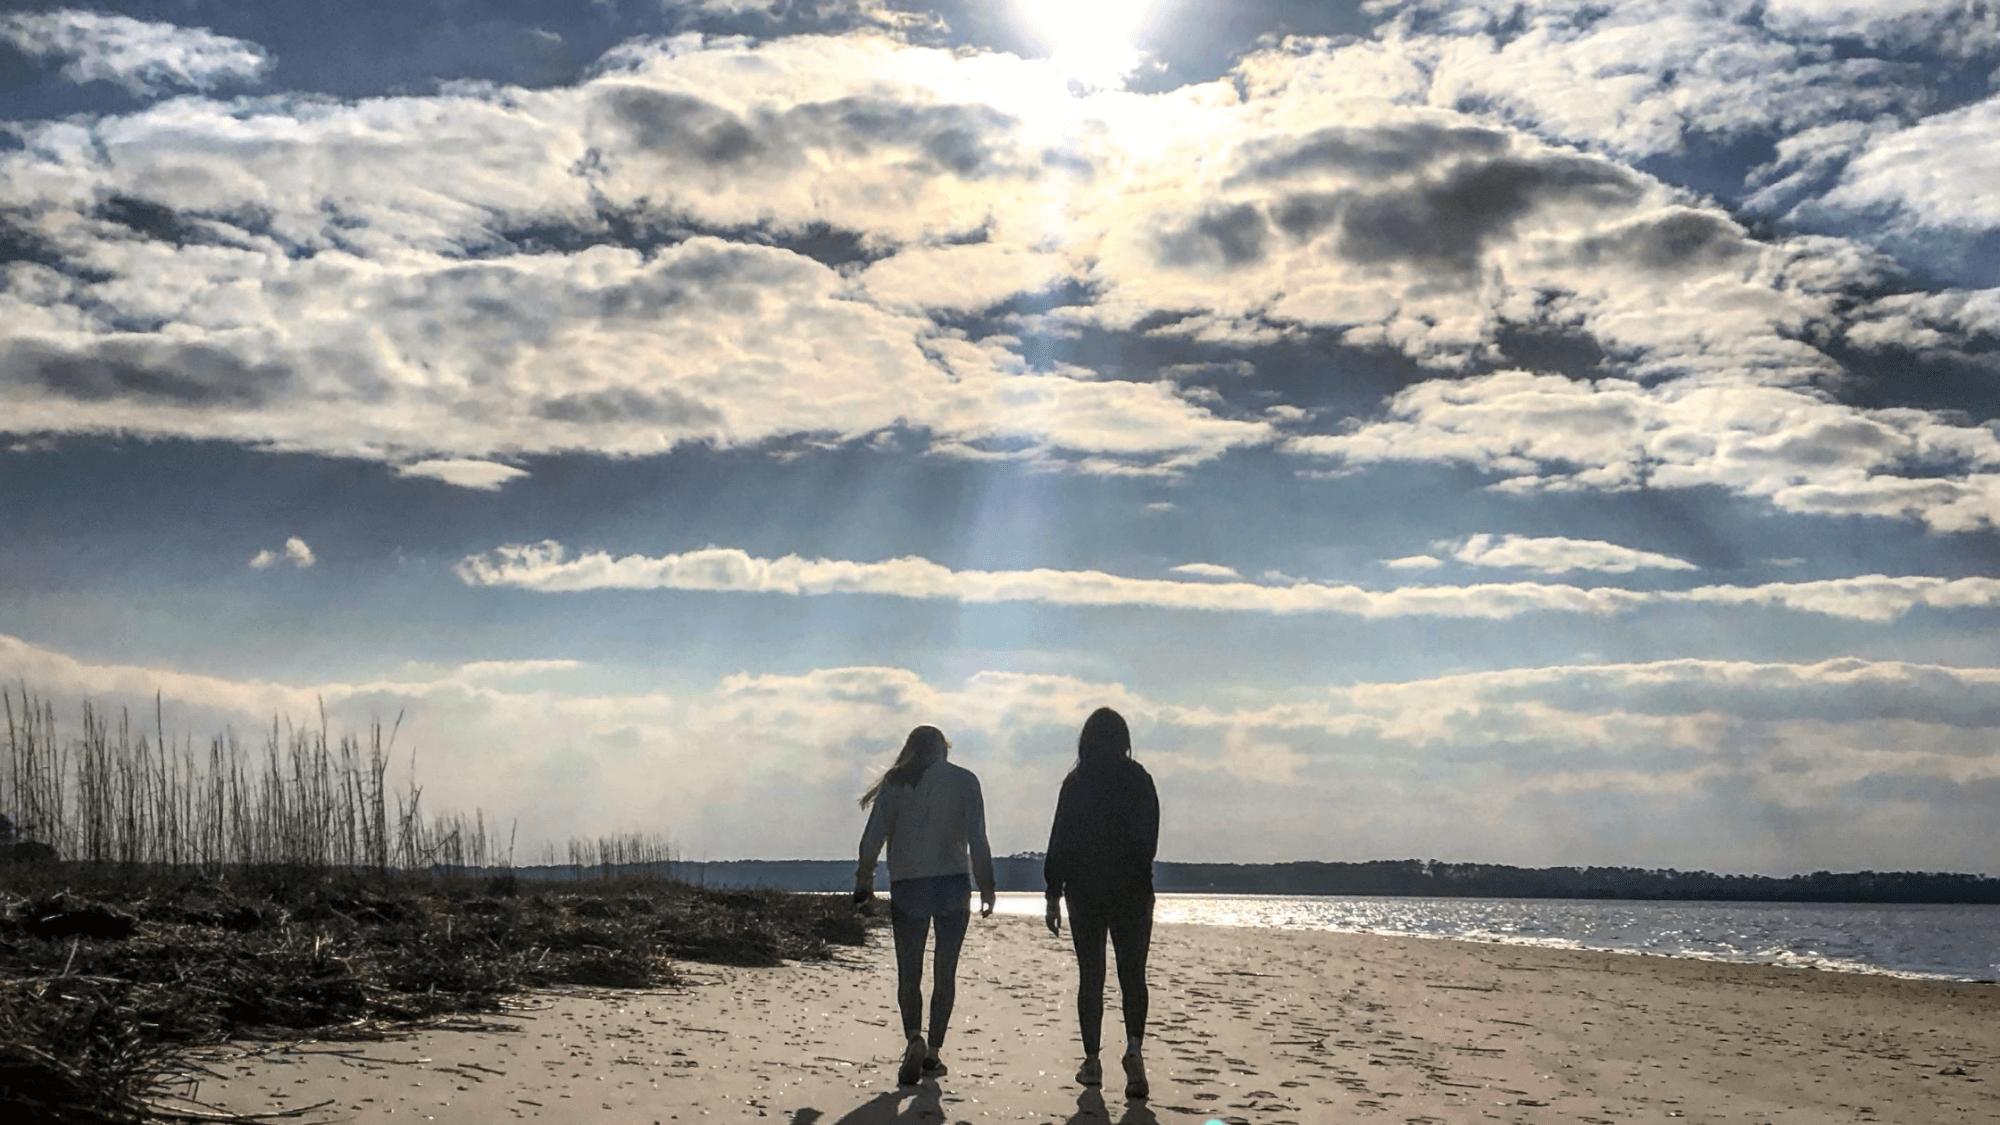 2 ladies on beach-Loss of Friendship